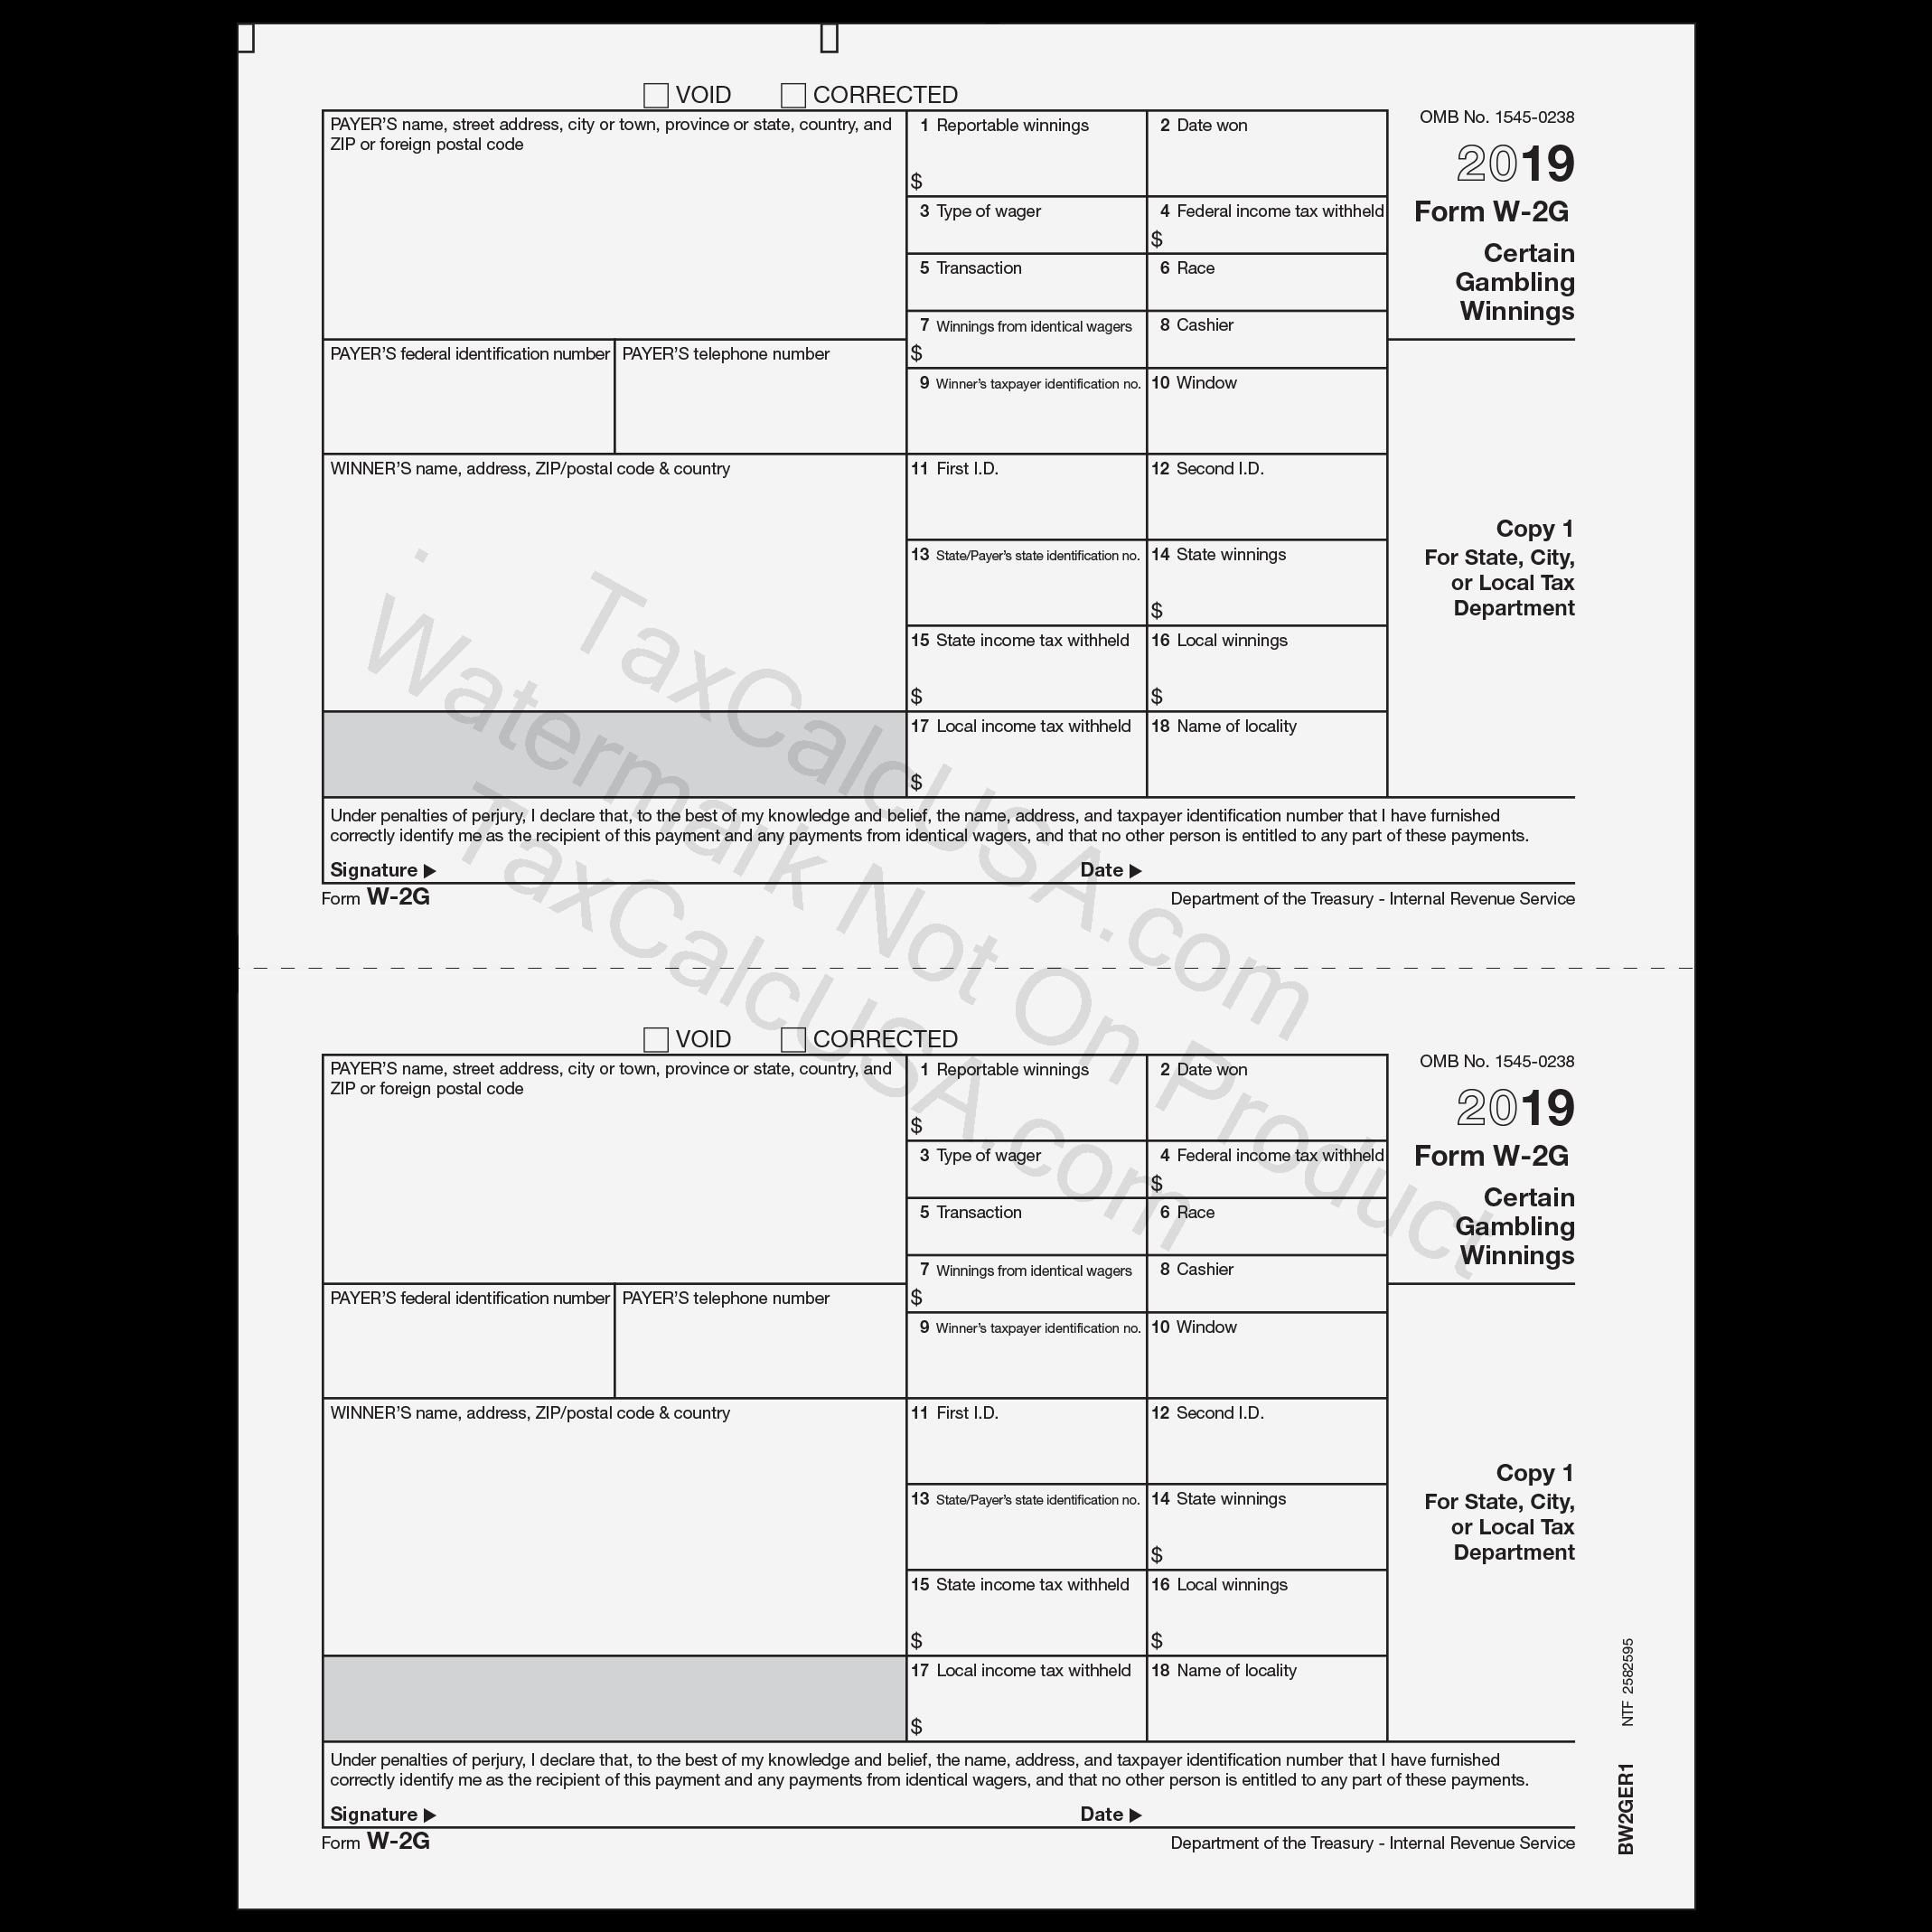 TaxCalcUSA - W-2 W-2G Tax Forms